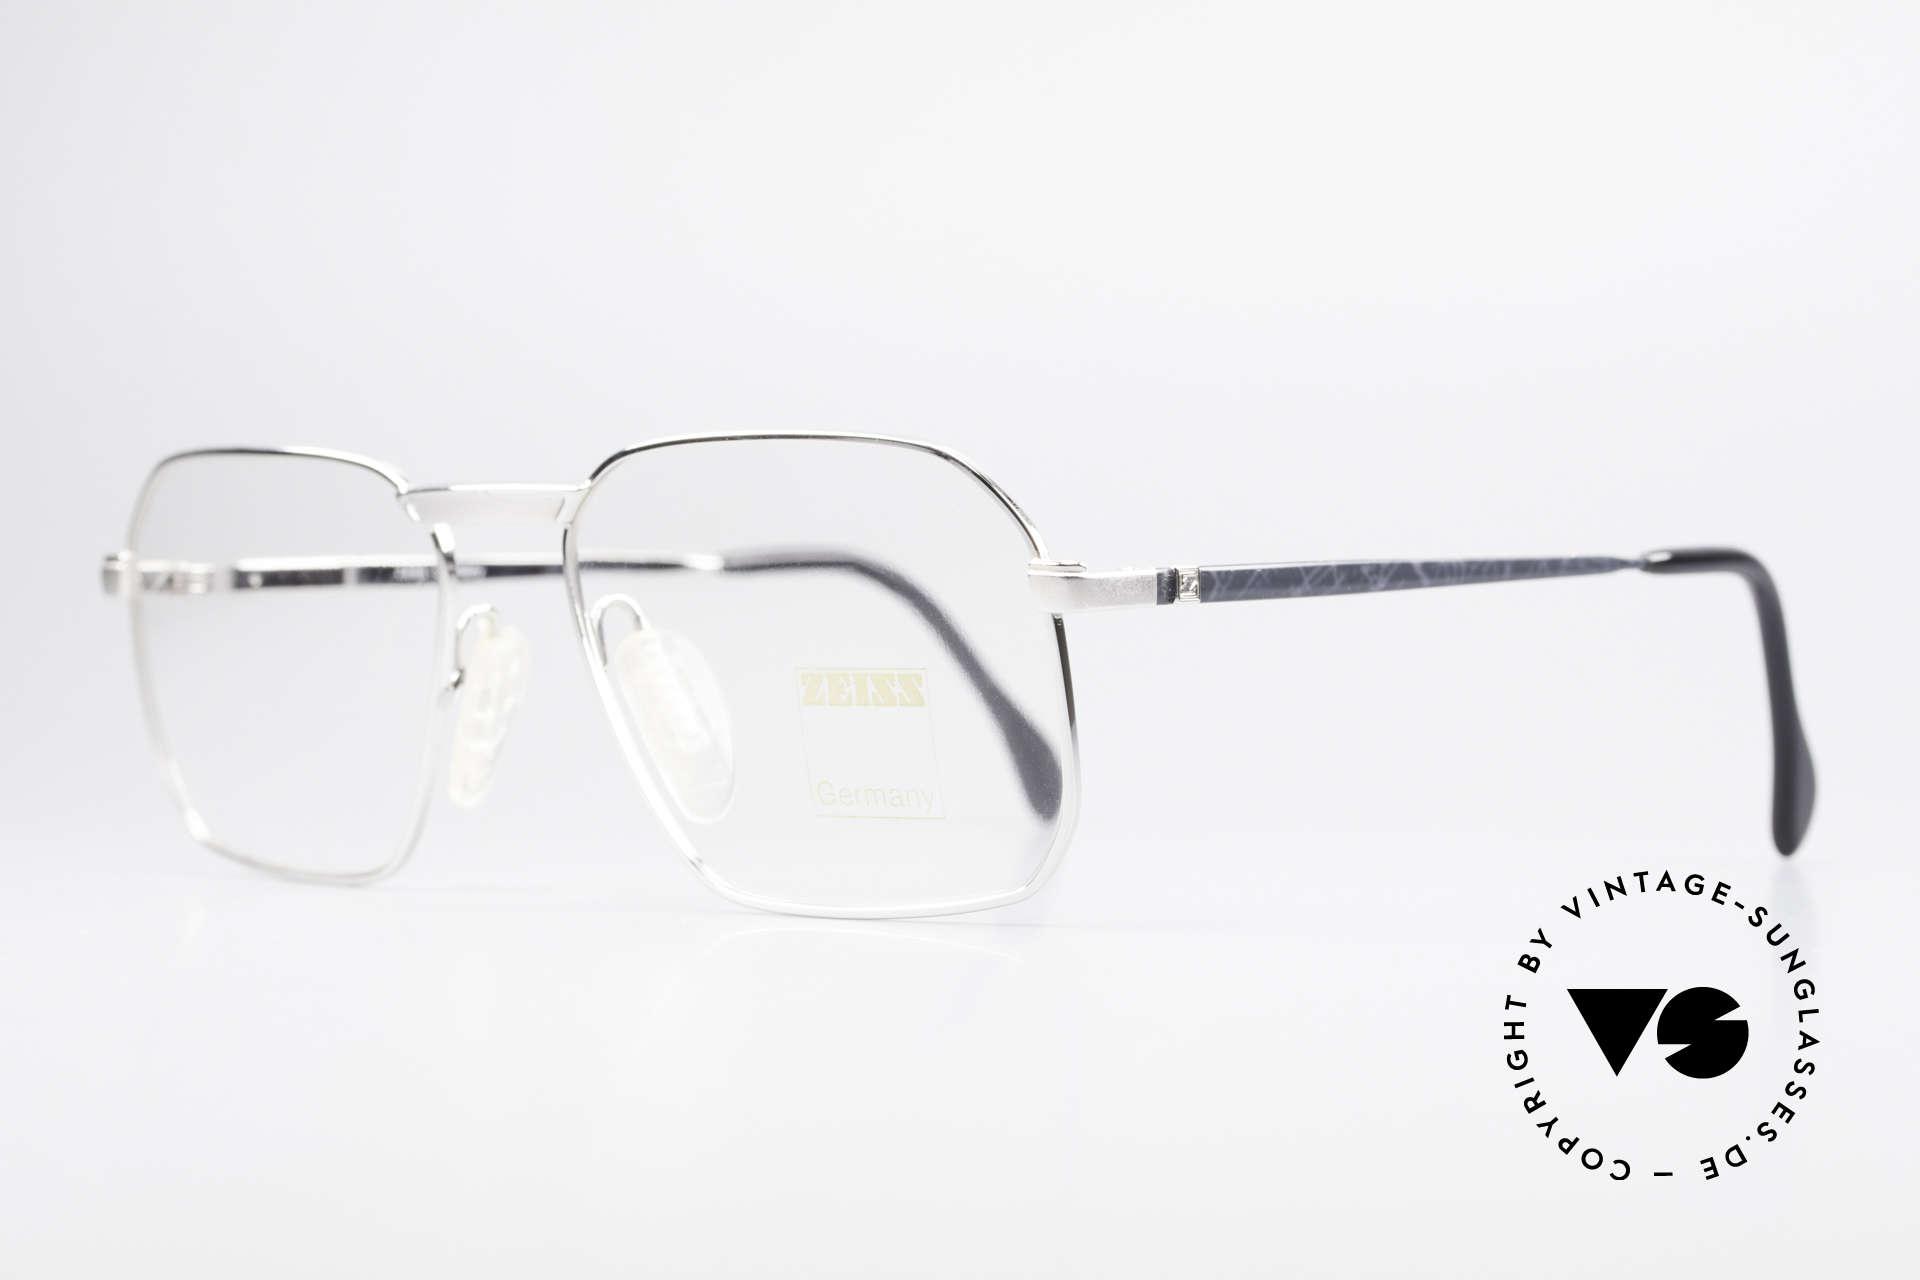 Zeiss 5922 Rare Old 90's Eyeglasses Men, monolithic design & flexible spring hinges: top comfort, Made for Men